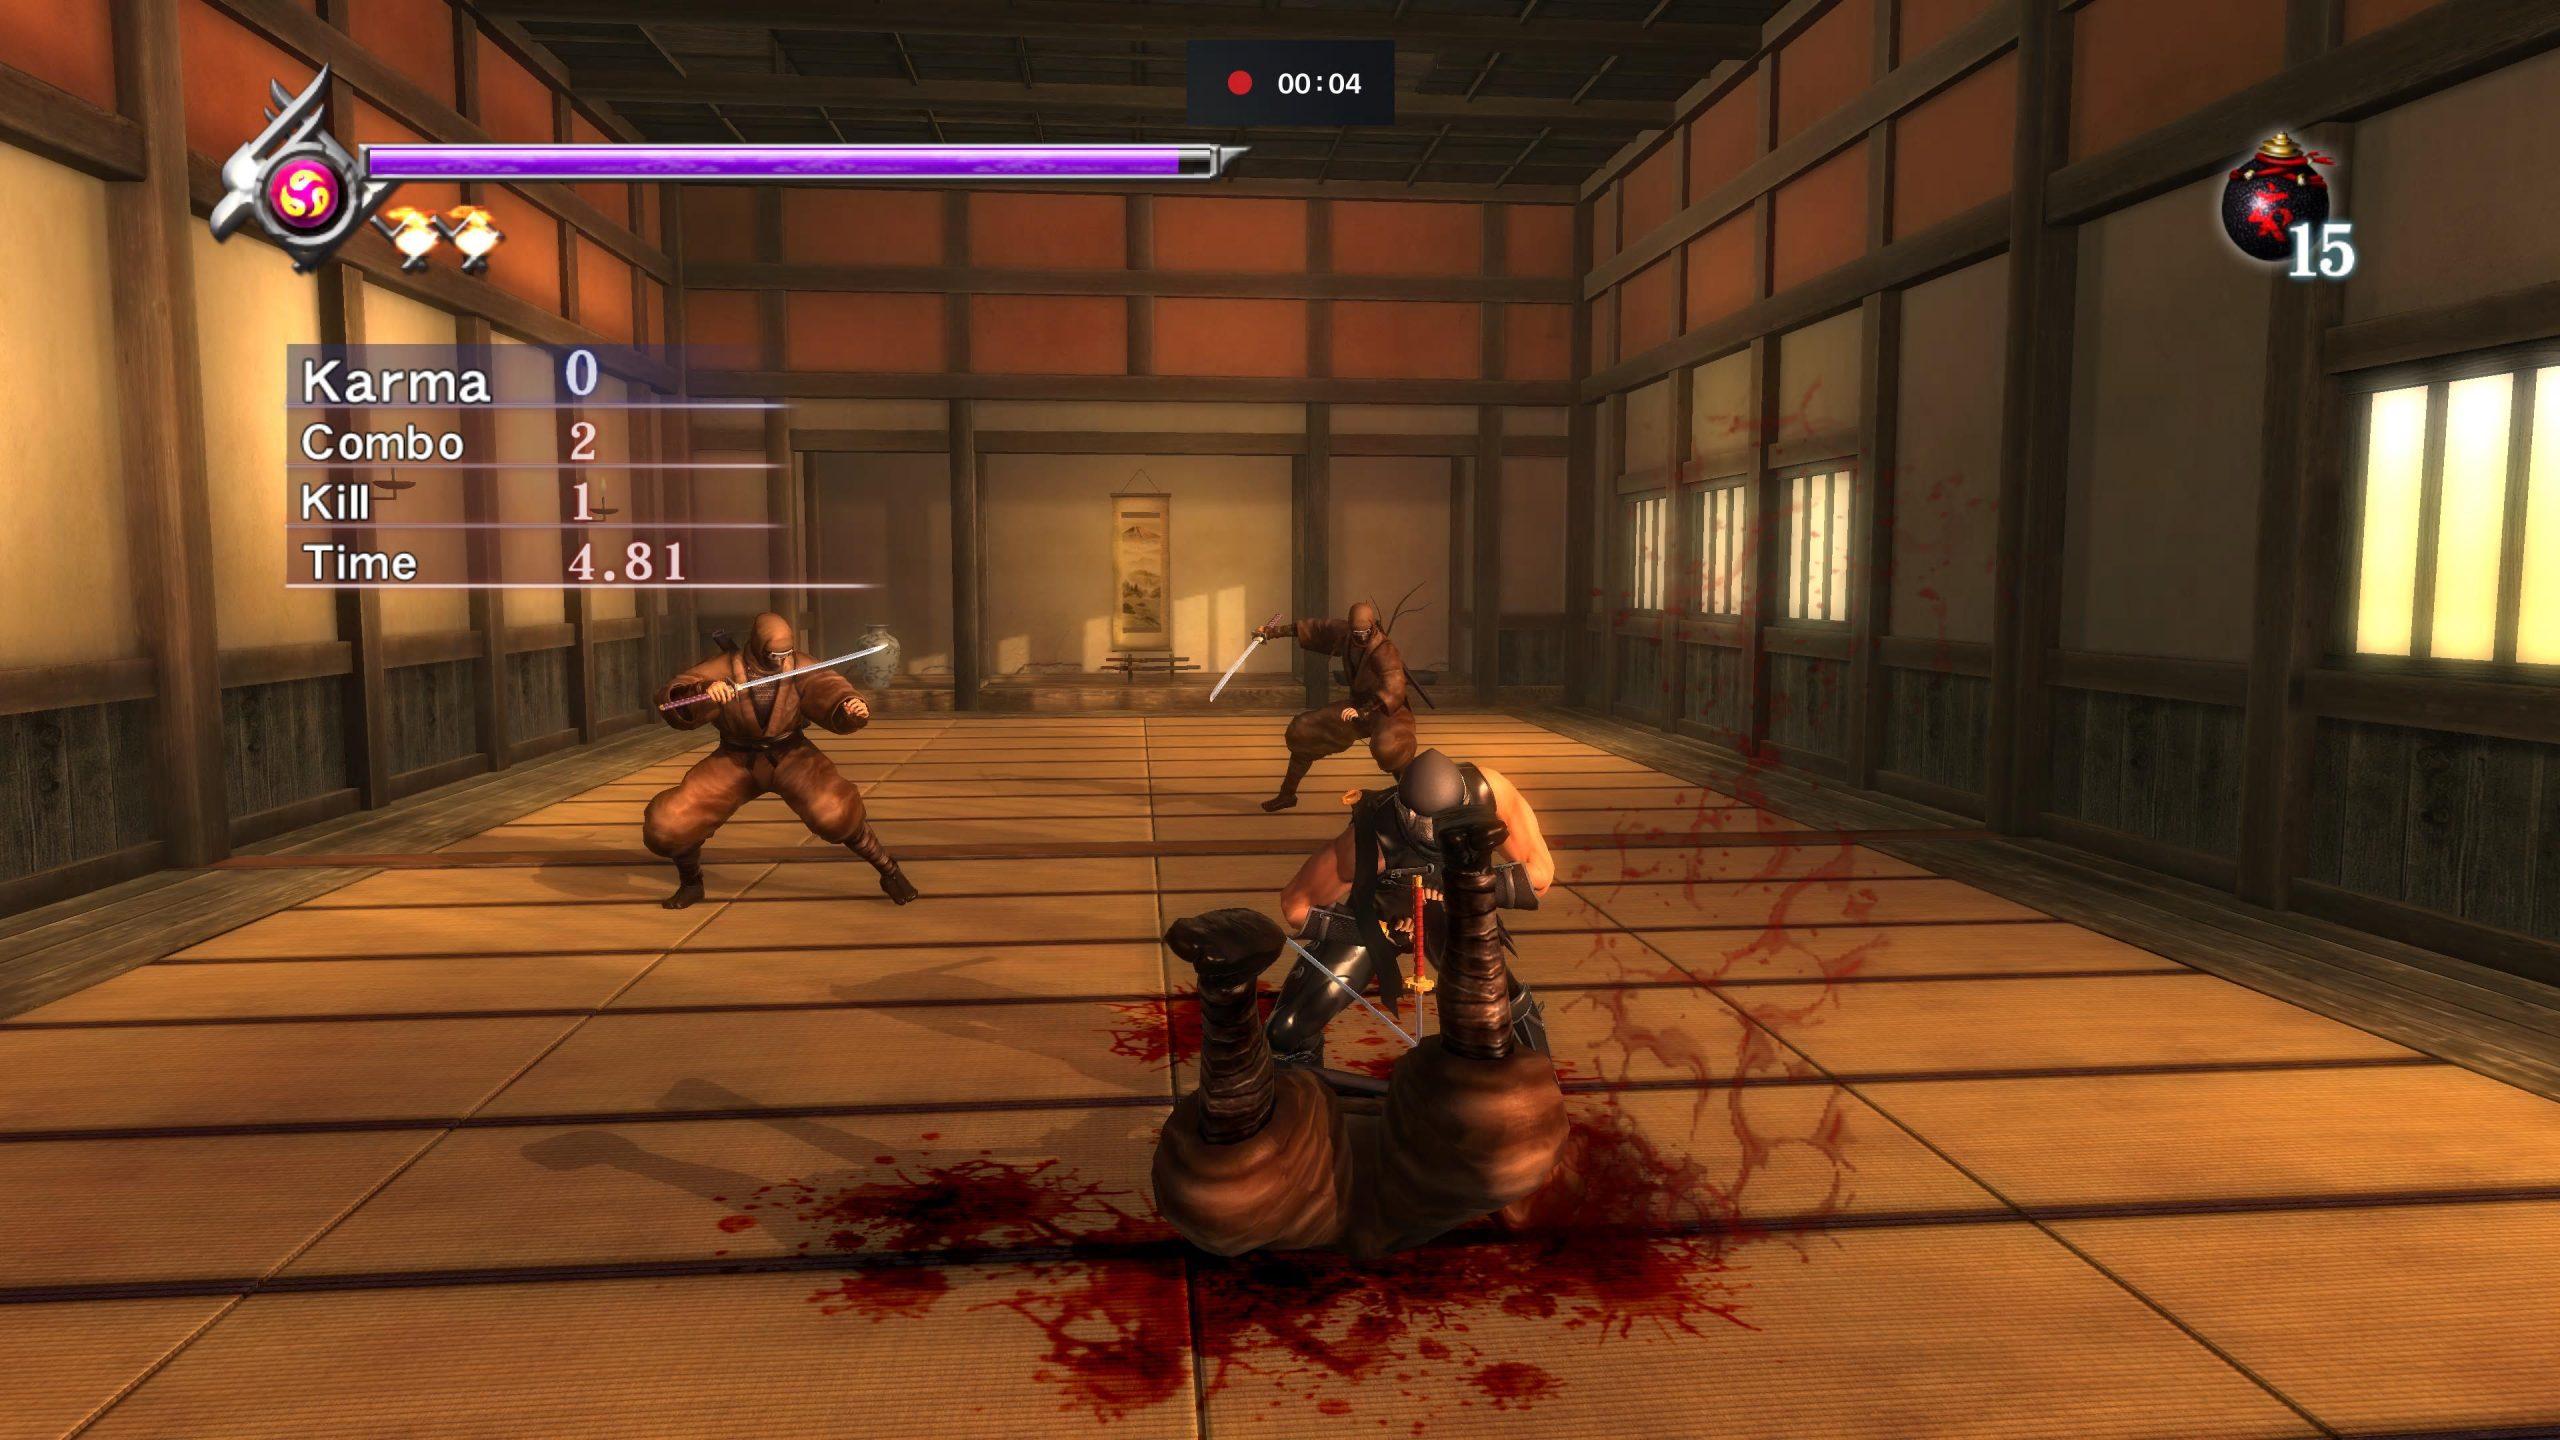 Stabbing a ninja in Ninja Gaiden: Master Collection